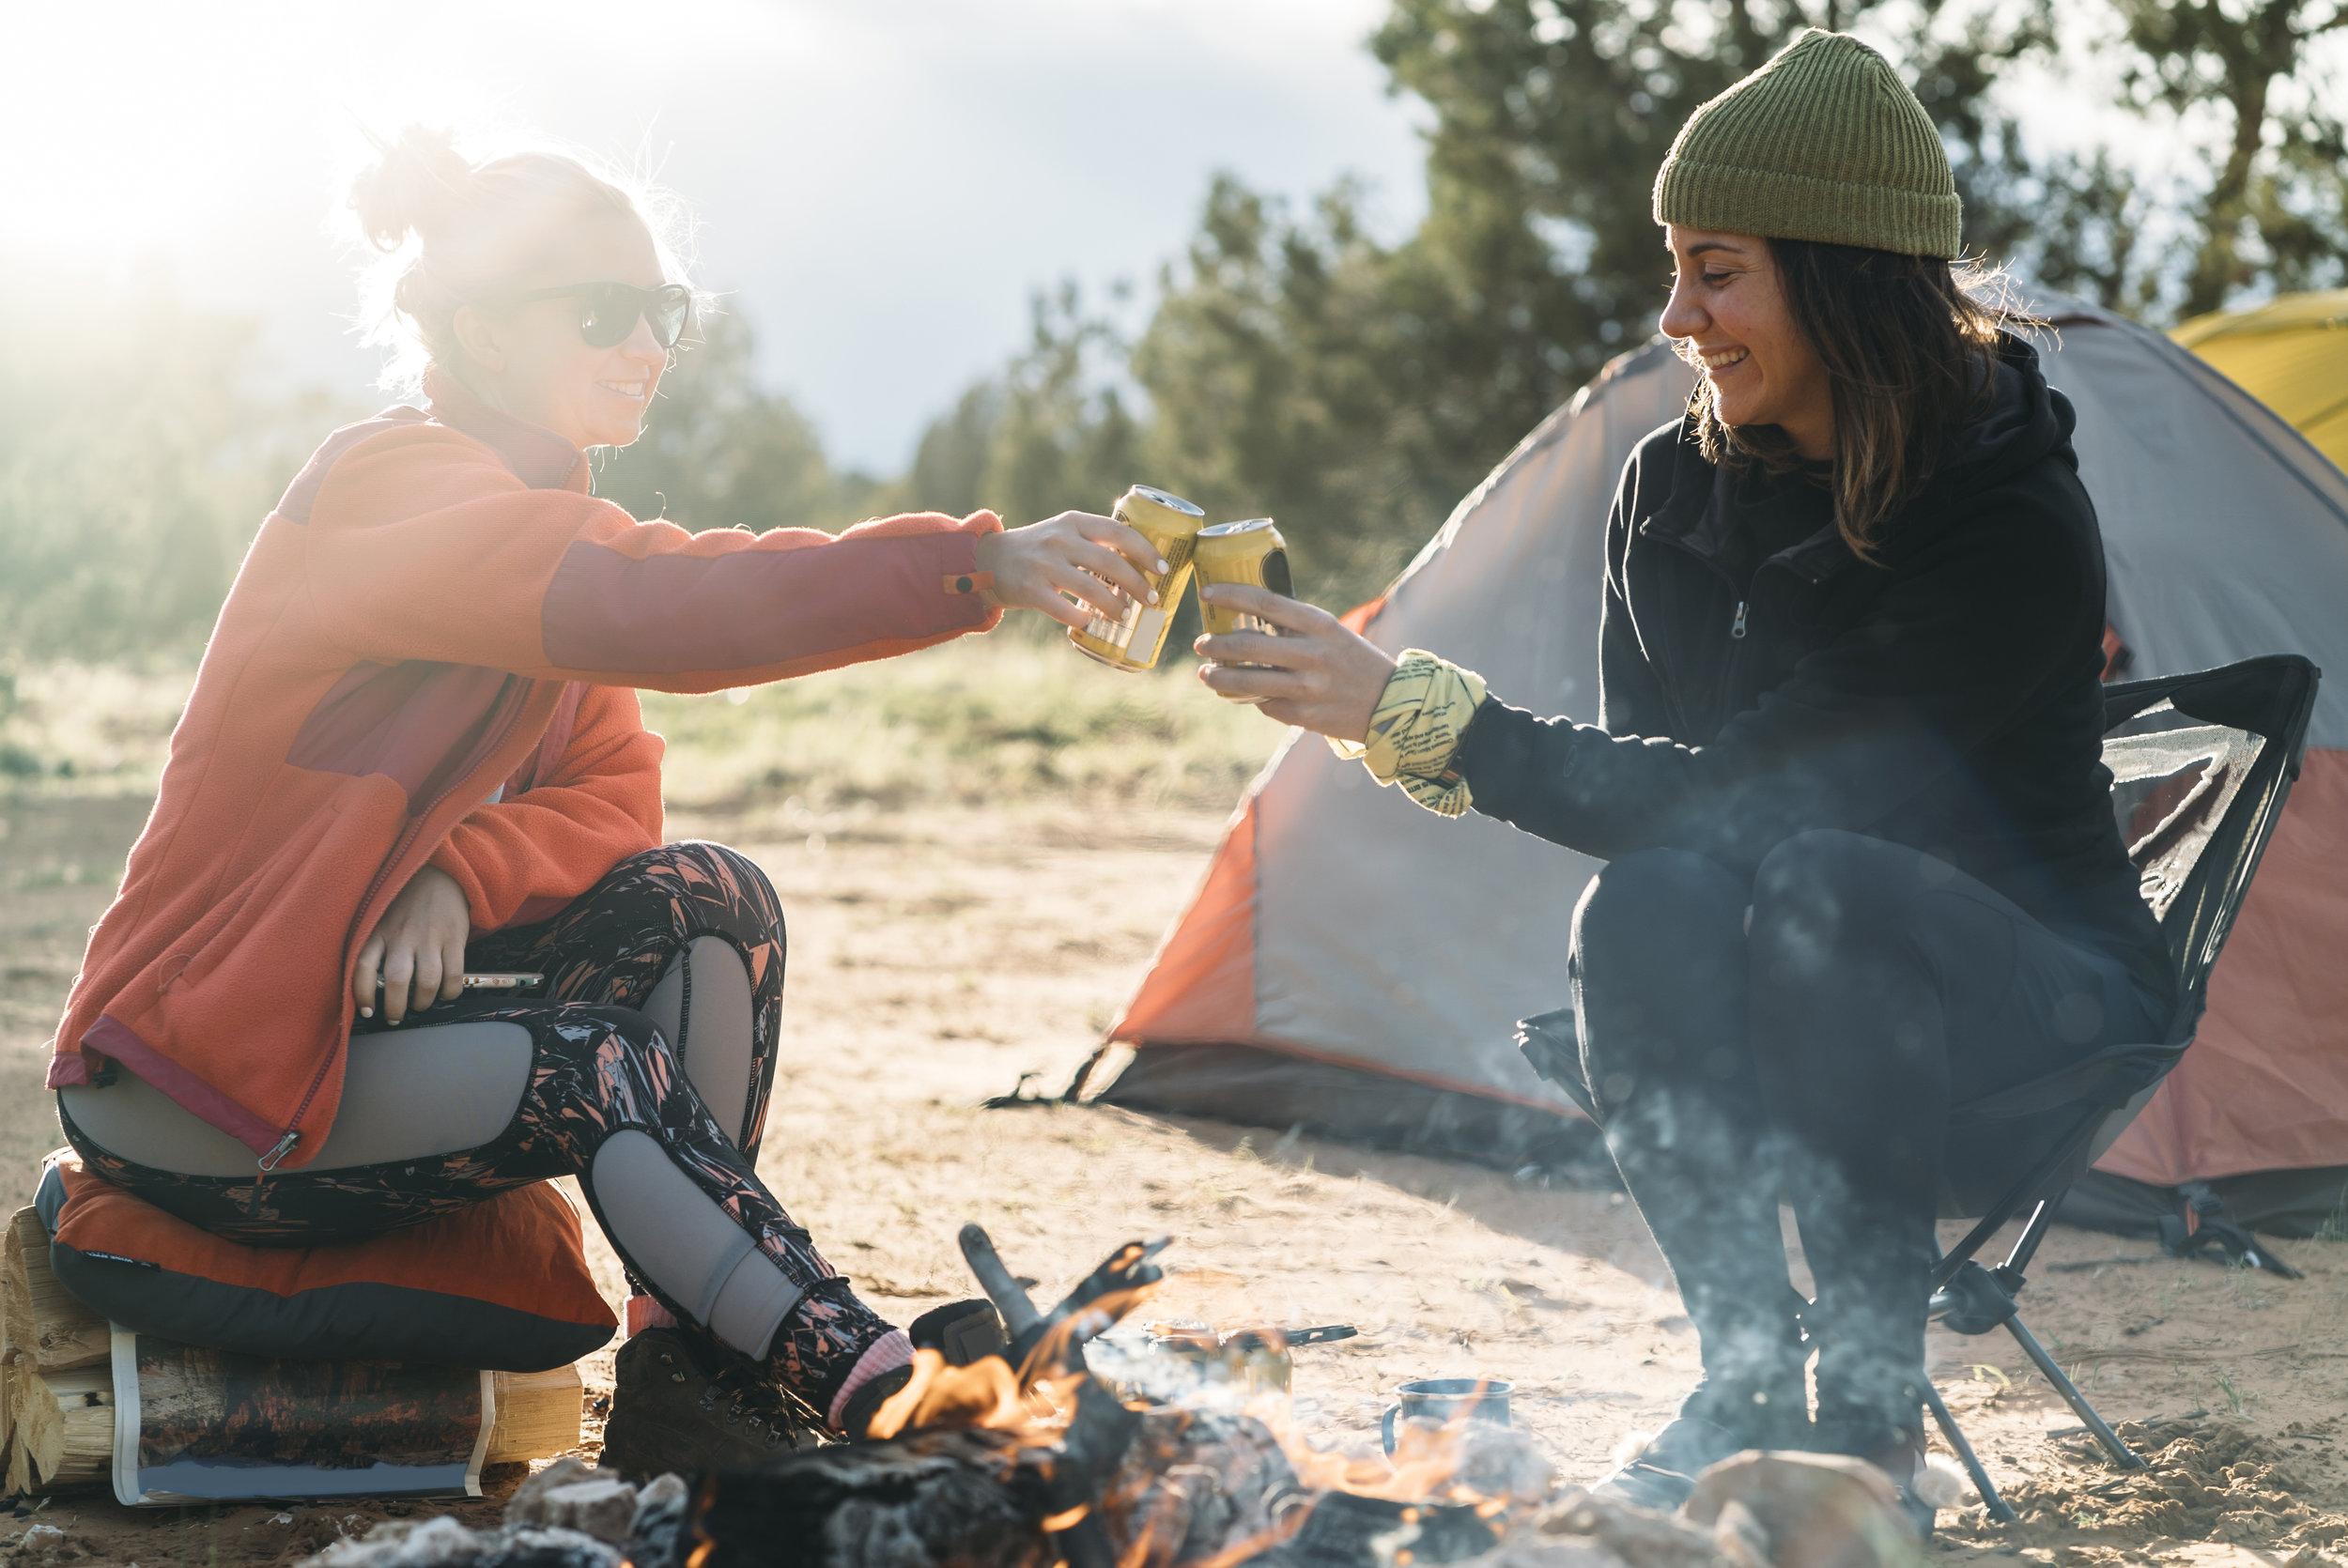 2019 MAY - Utah - photo cred Natalie Rhea-0638.jpg